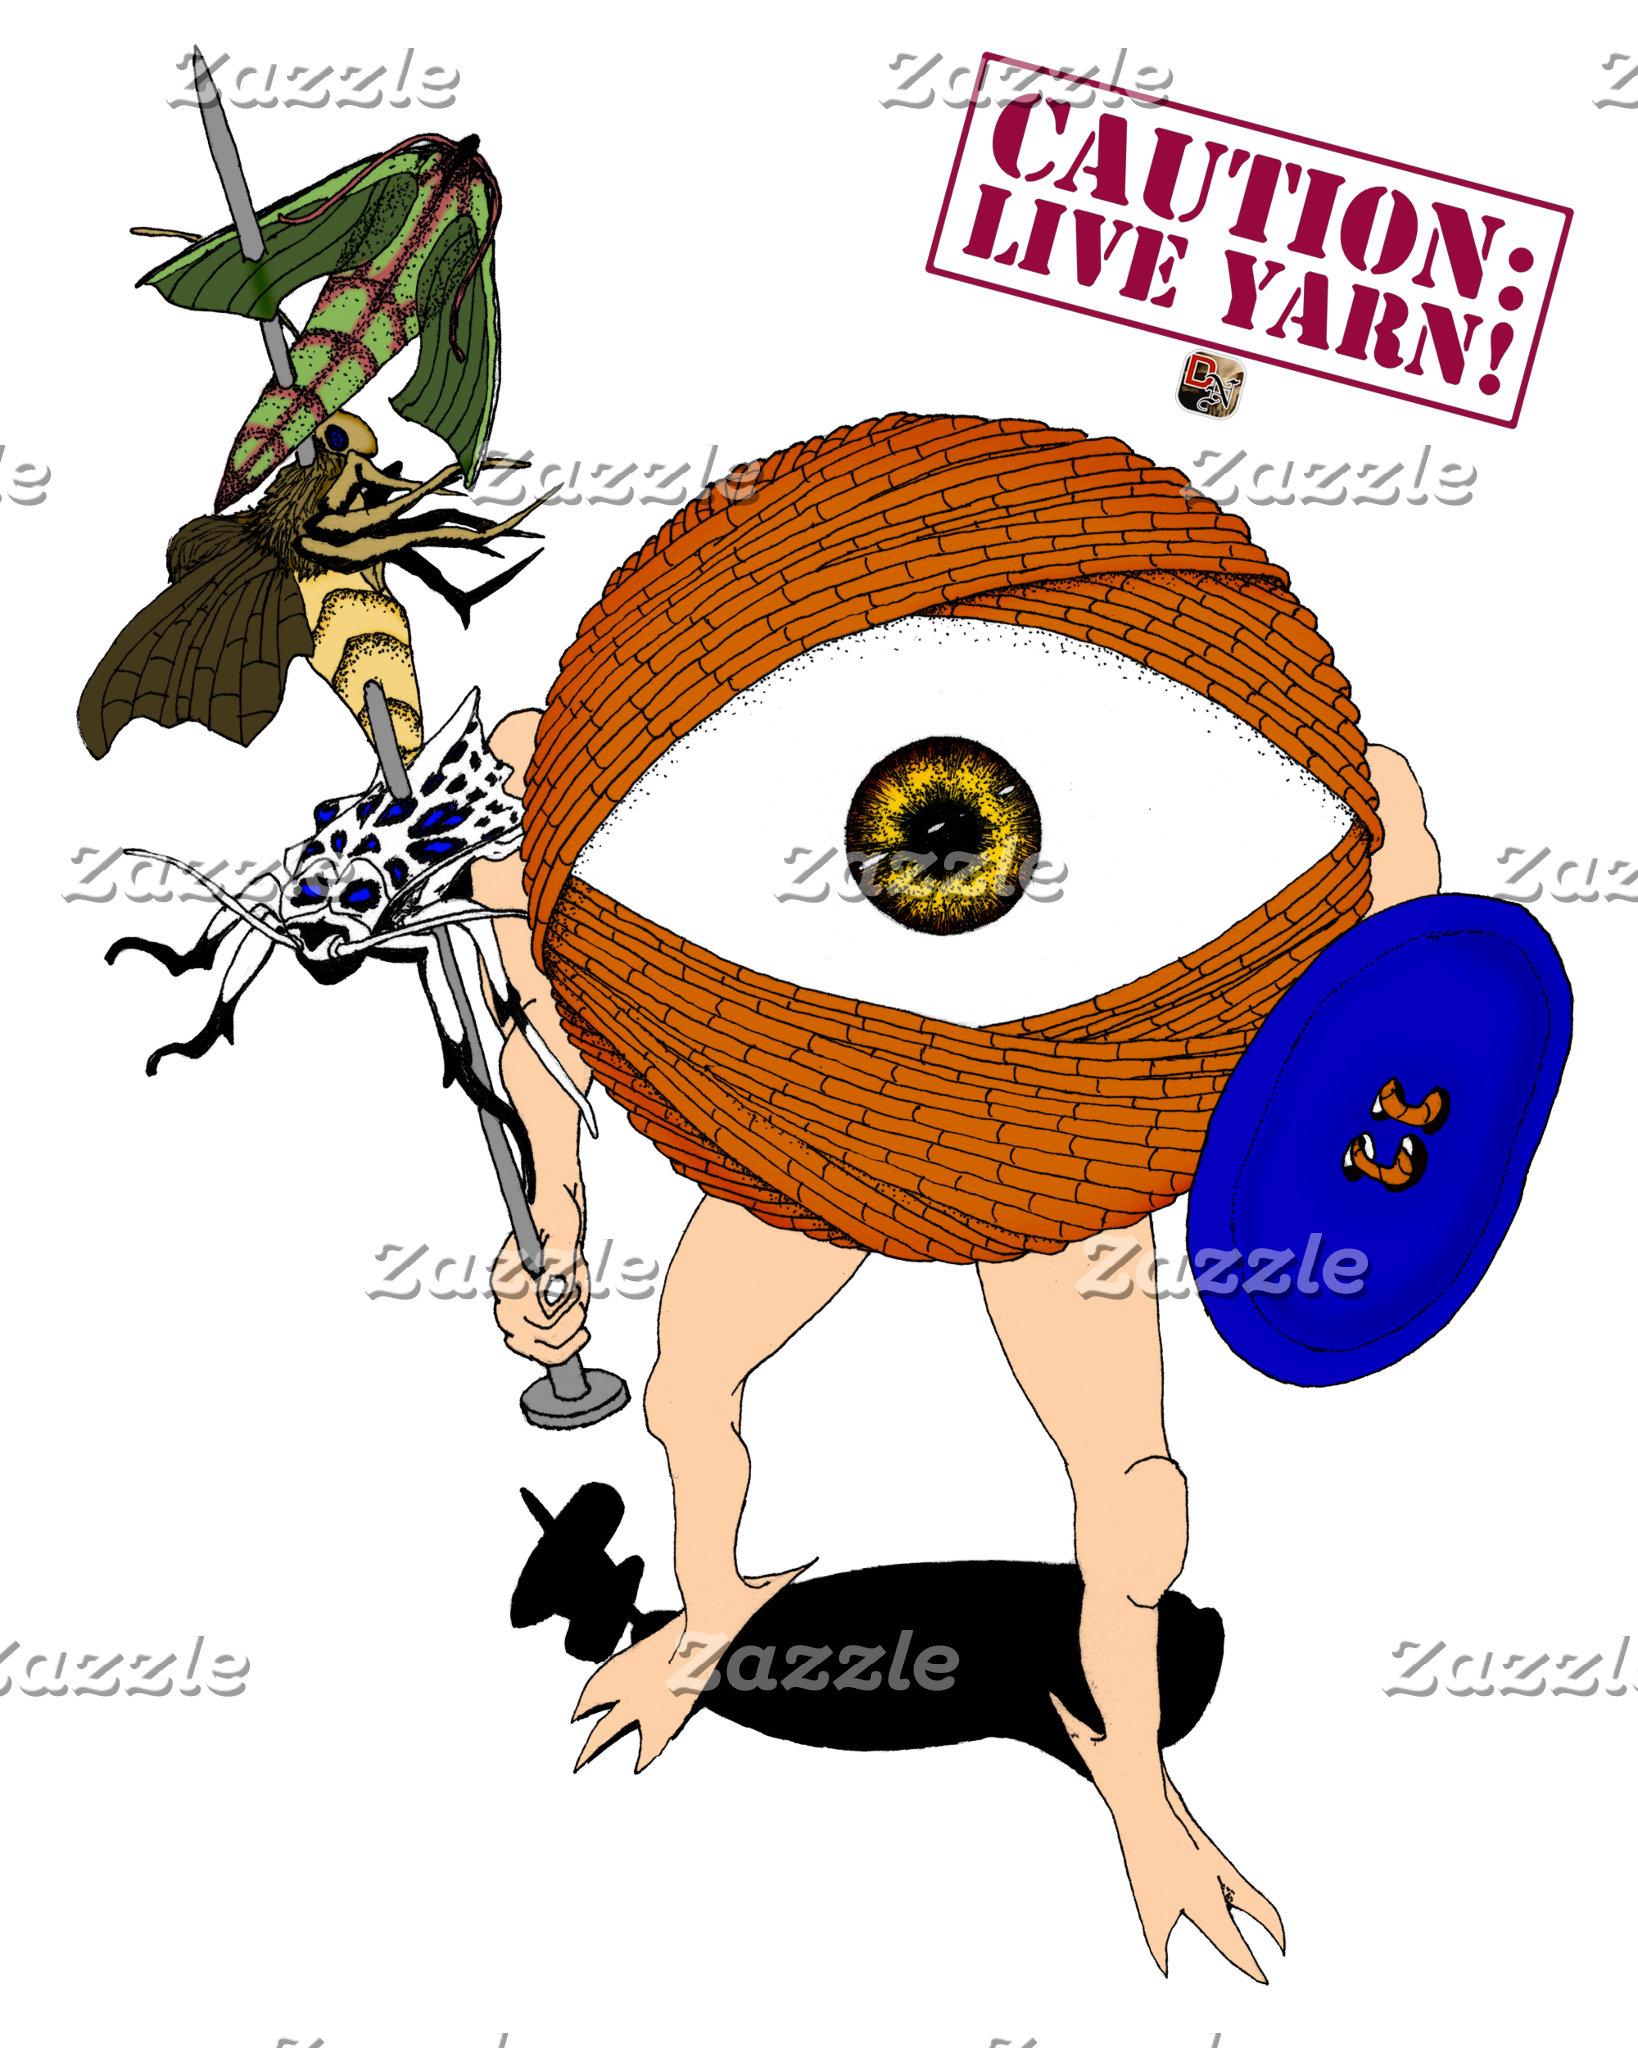 Caution: Live Yarn! Hunter